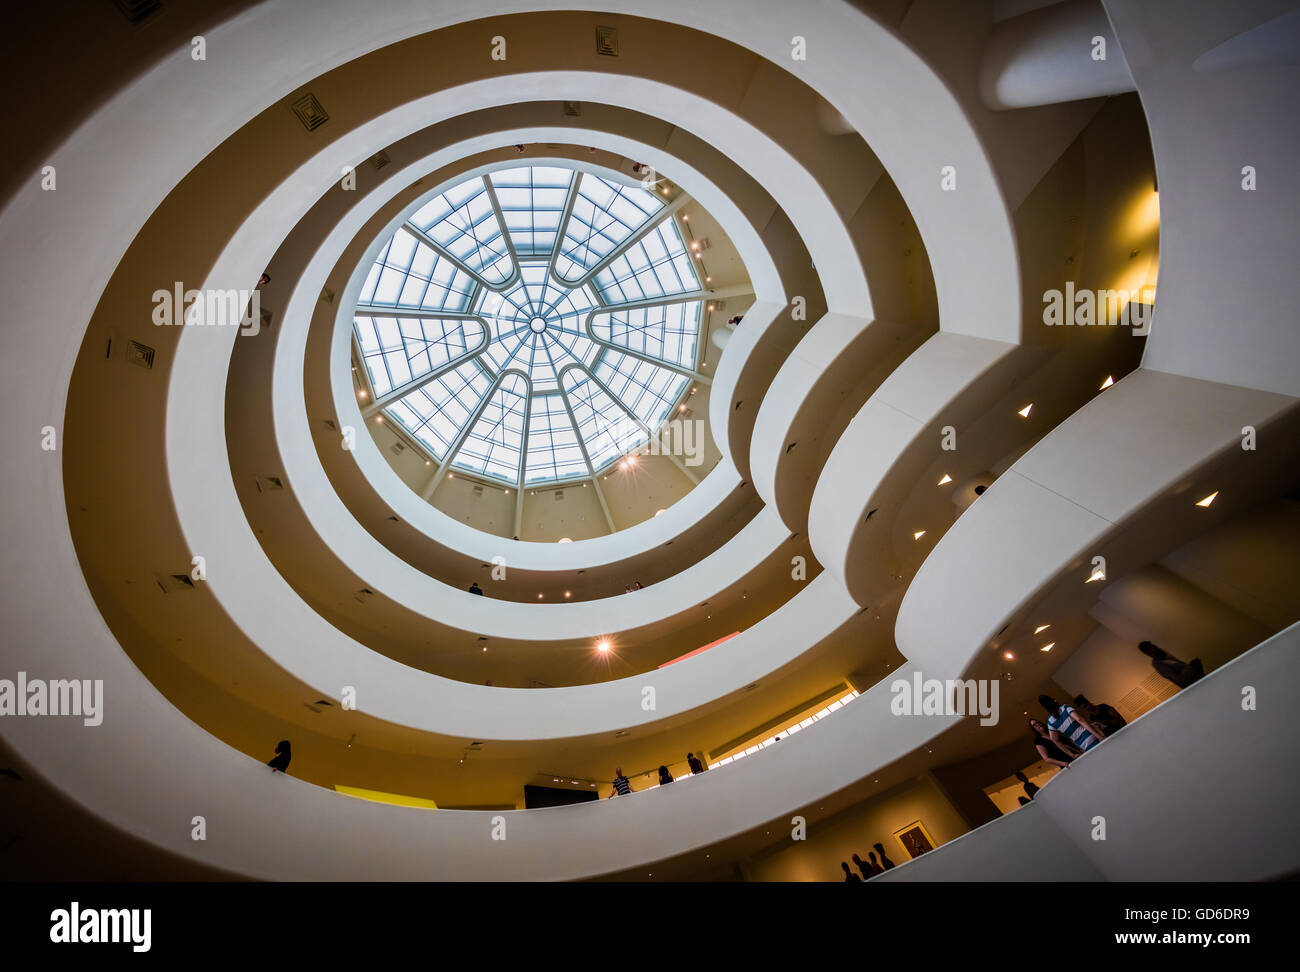 Das Solomon R. Guggenheim Museum ist ein Kunstmuseum in New York City gelegen Stockbild